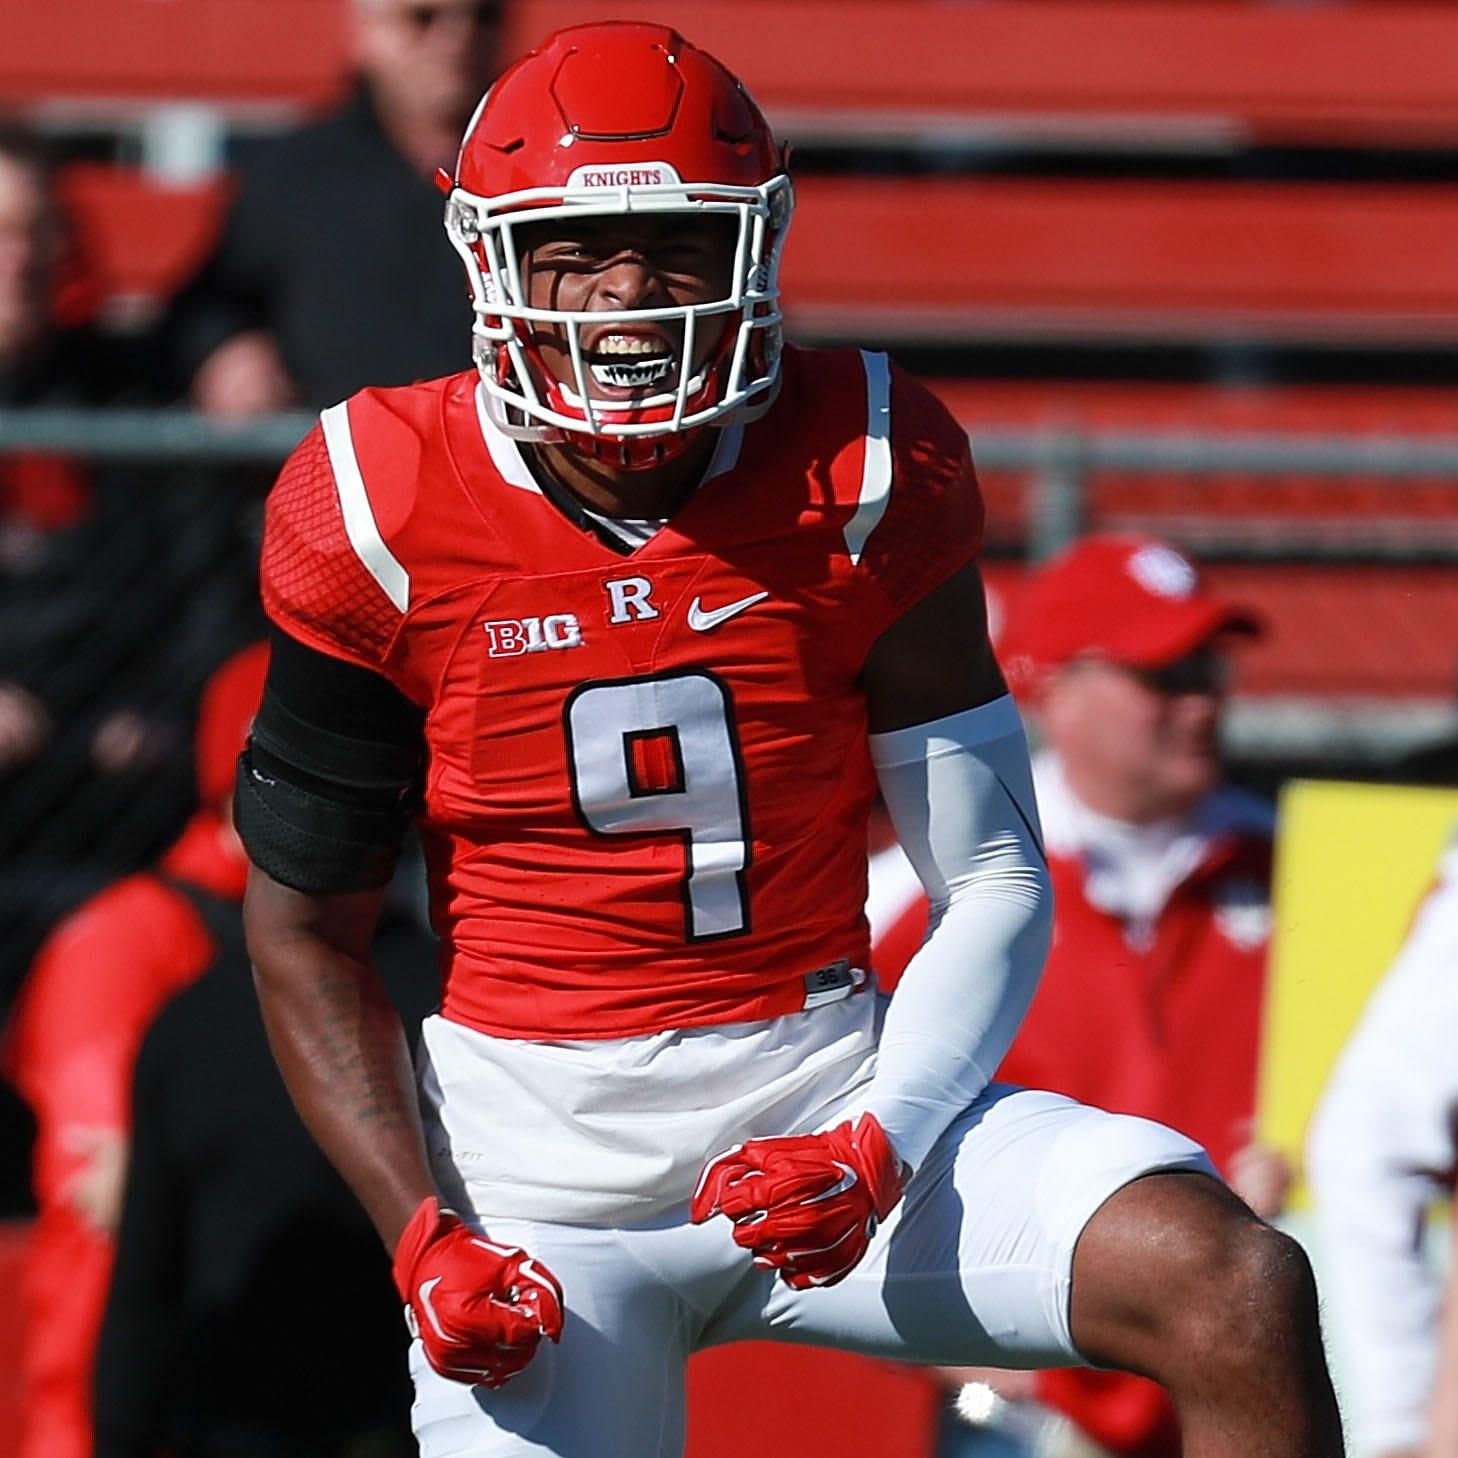 2019 NFL Draft: Rutgers' Saquan Hampton selected in sixth round by Saints